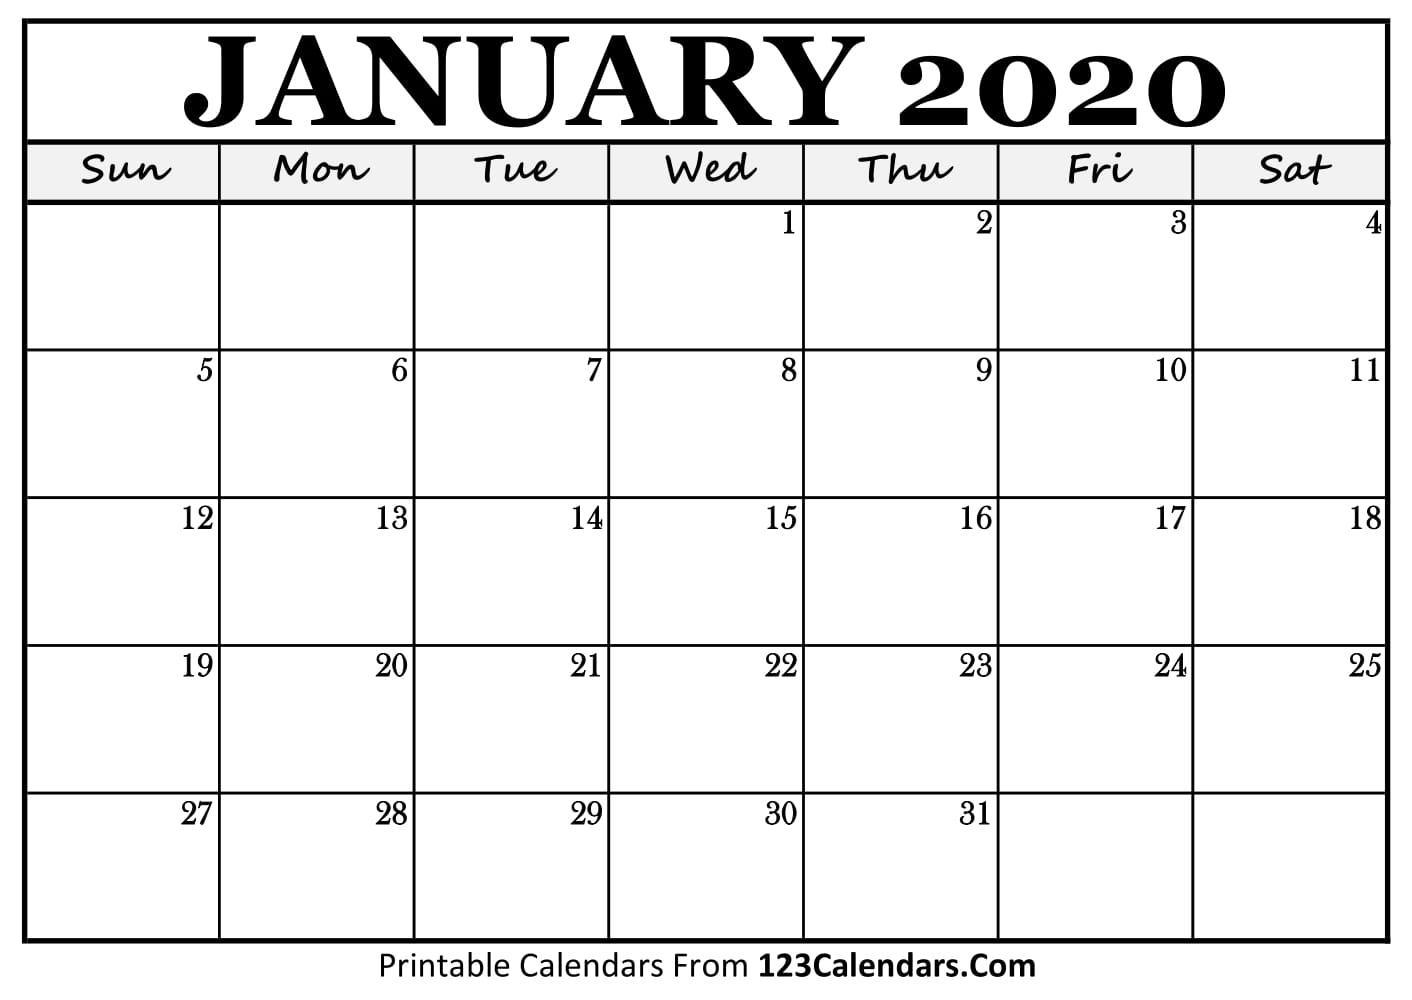 January 2020 Printable Calendar | 123Calendars regarding Large Print Free Printable Calendar 2020